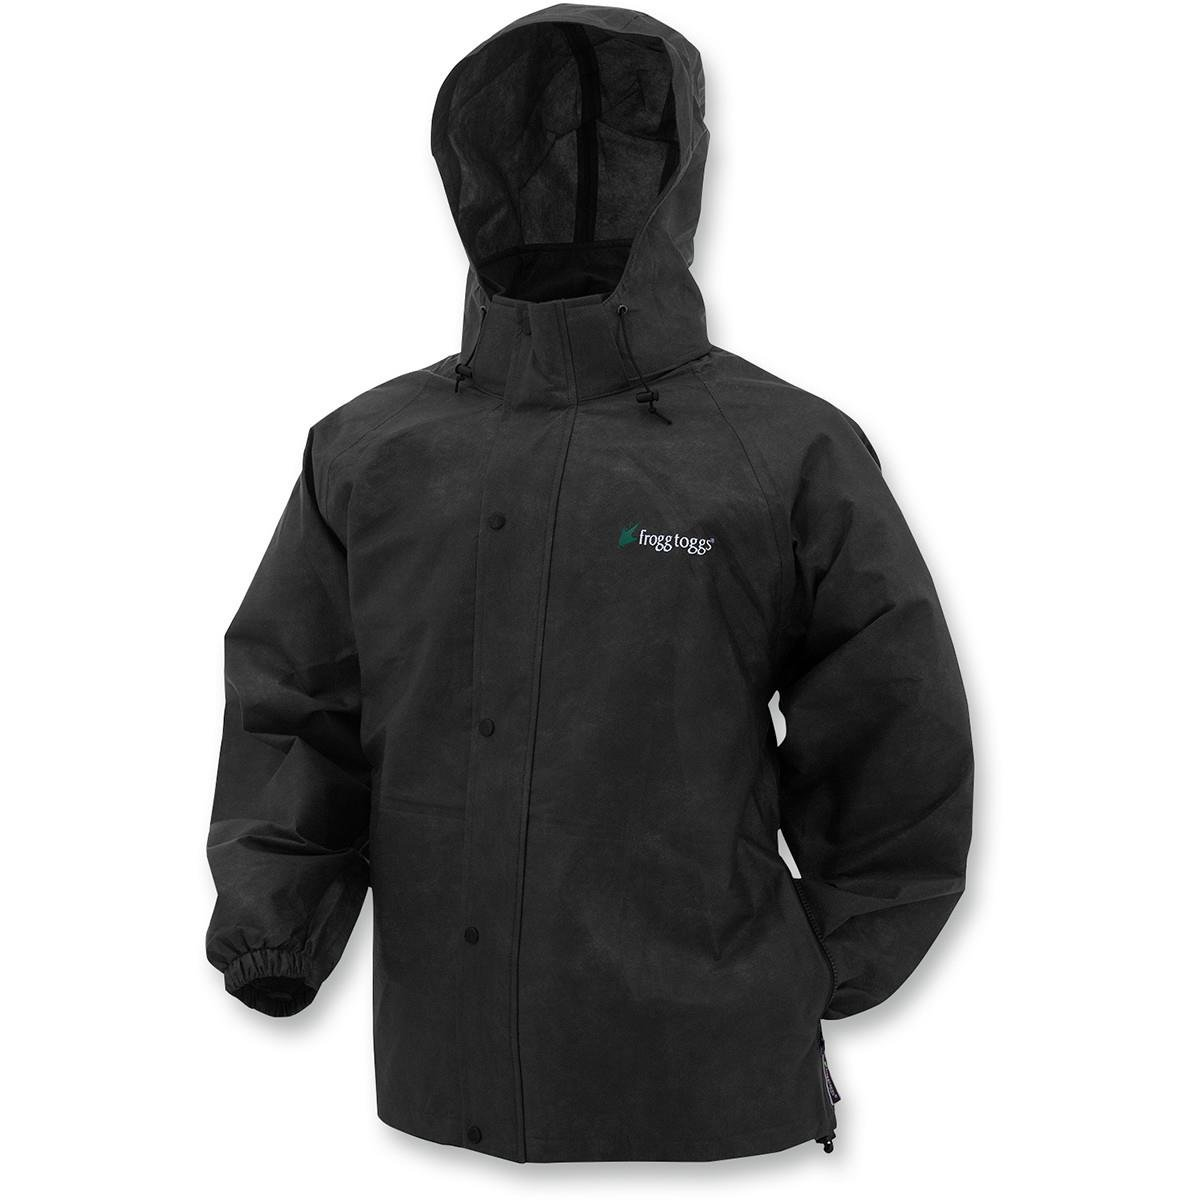 Frogg Toggs Pro Action Rain Jacket, Size: 2XL, Distinct Name: Black, Gender: Mens/Unisex, Primary Color: Black